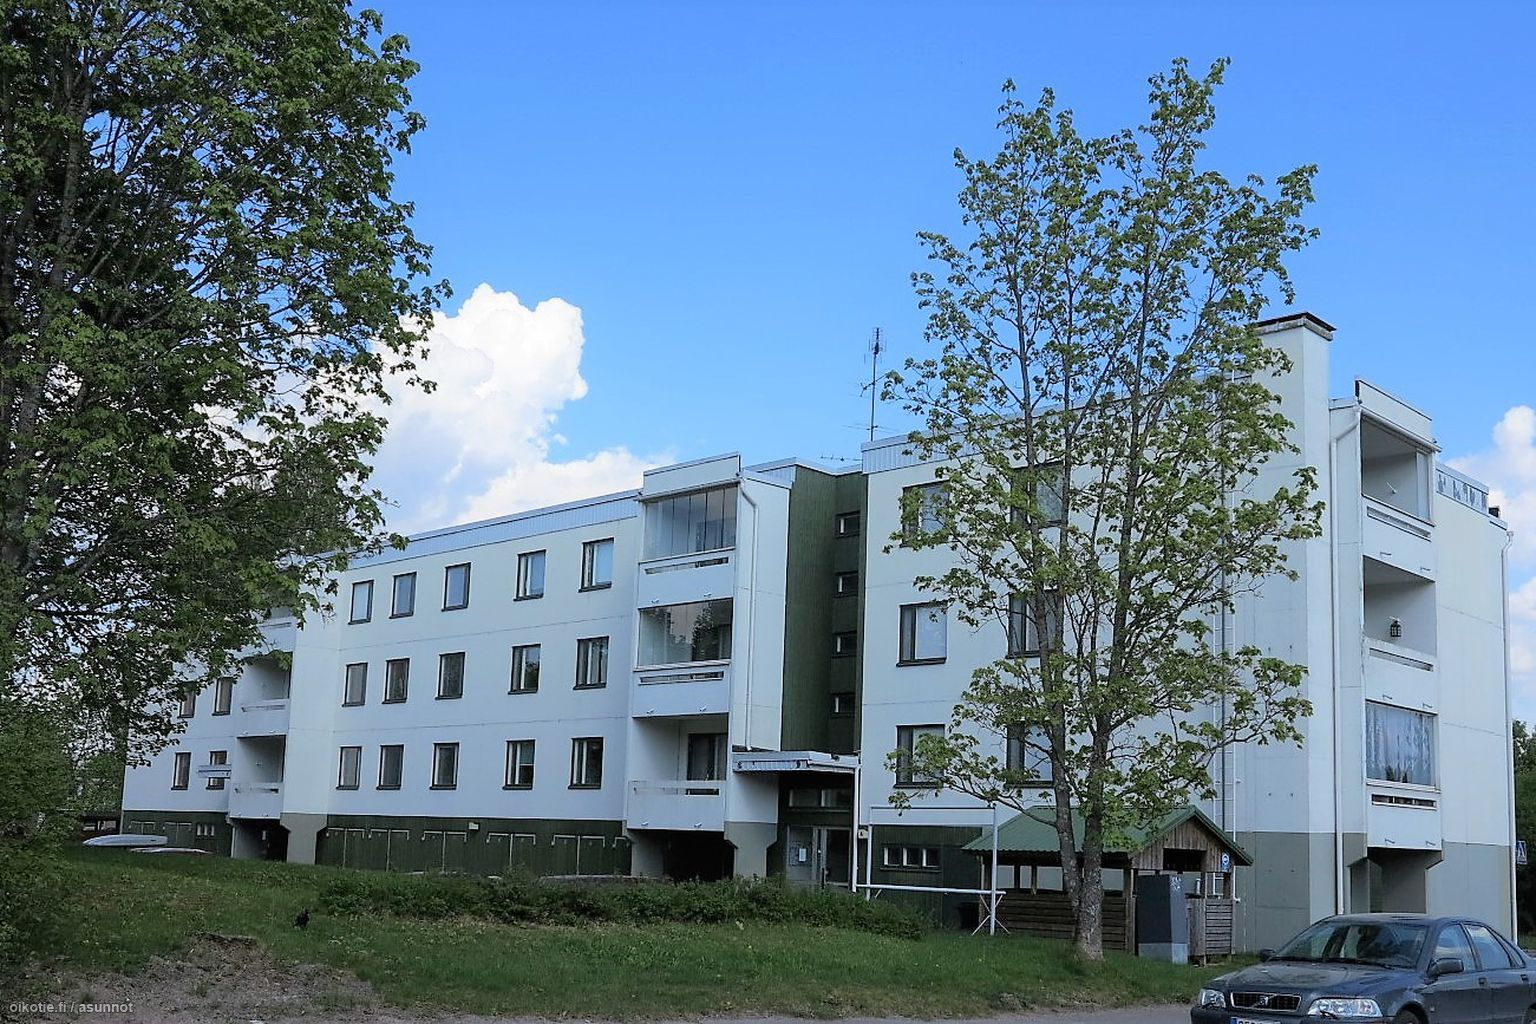 76 m² Peltolankatu 42 A, 55800 Imatra Kerrostalo 3h